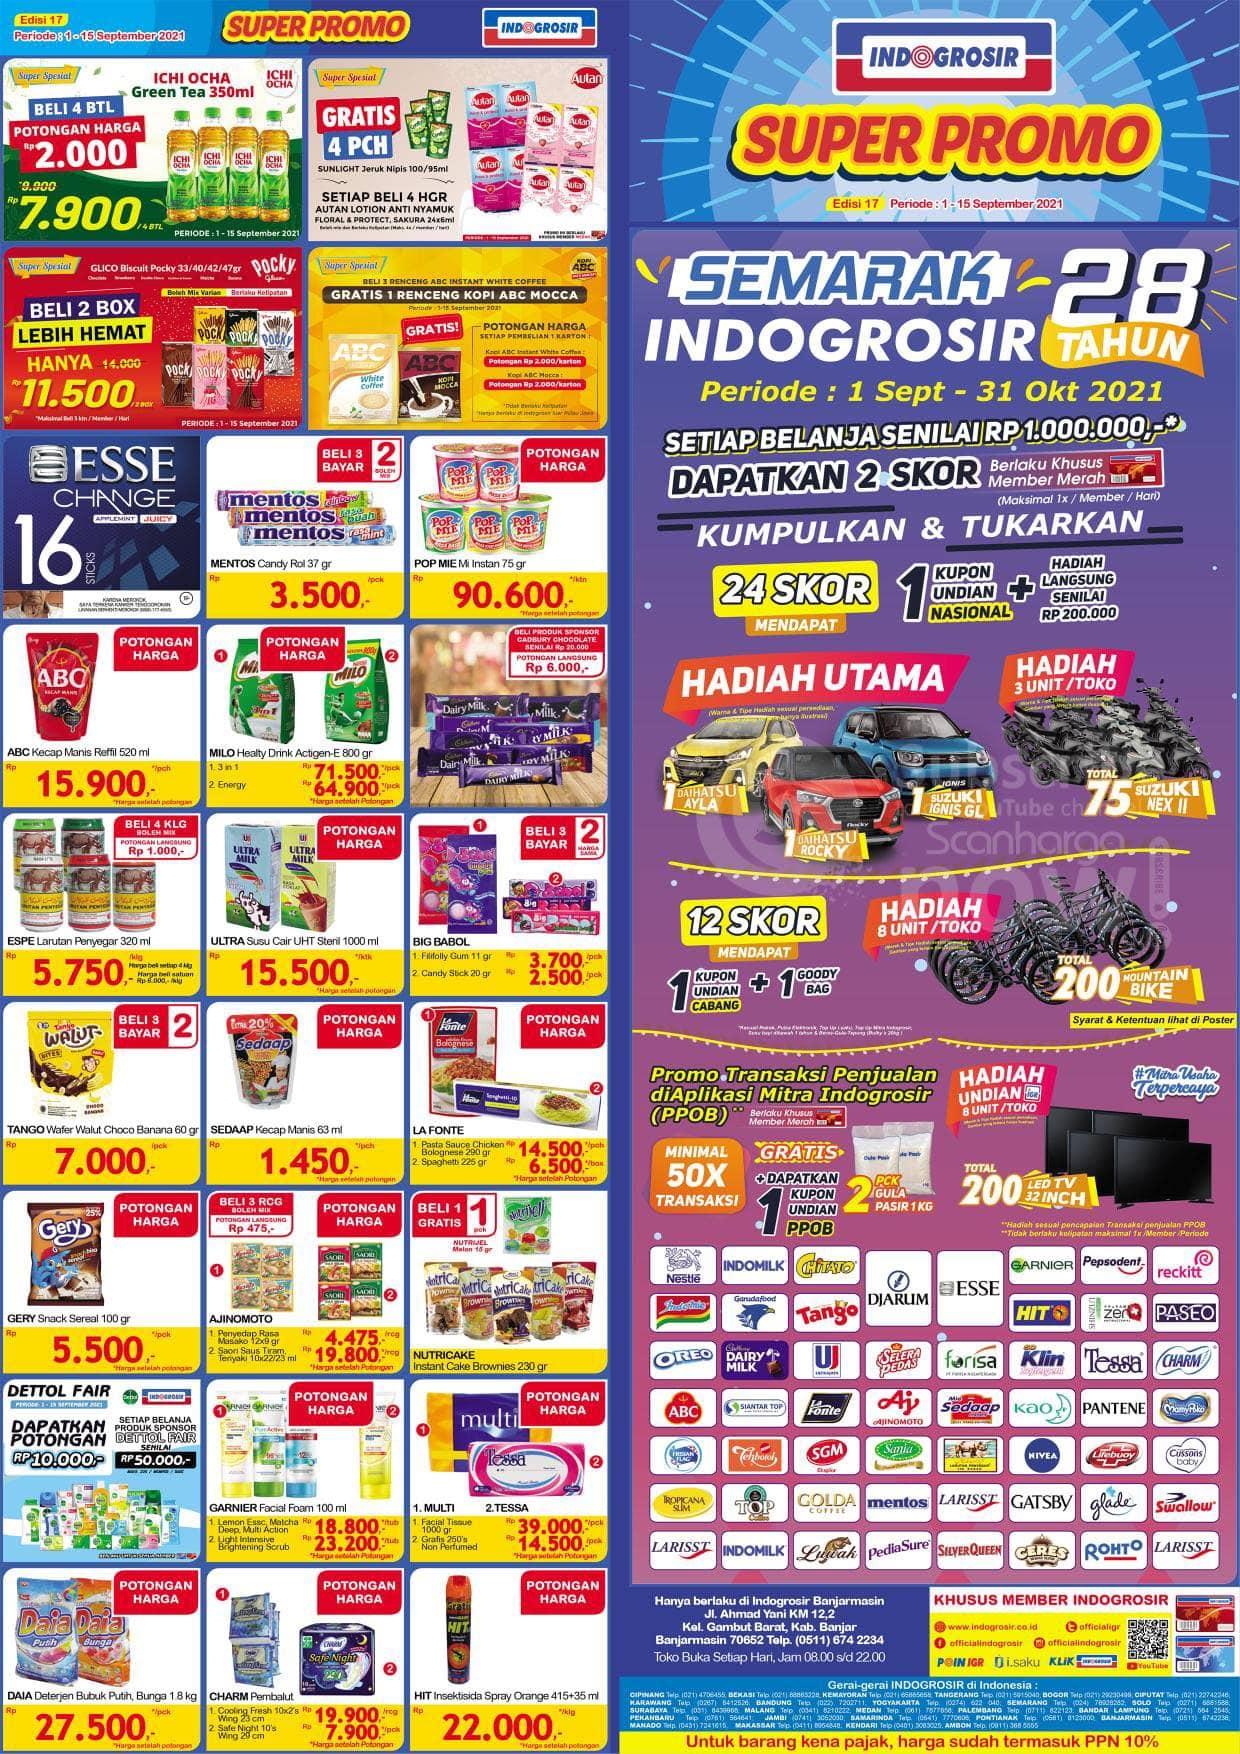 Katalog INDOGROSIR Super Promo Periode 1 - 15 September 2021